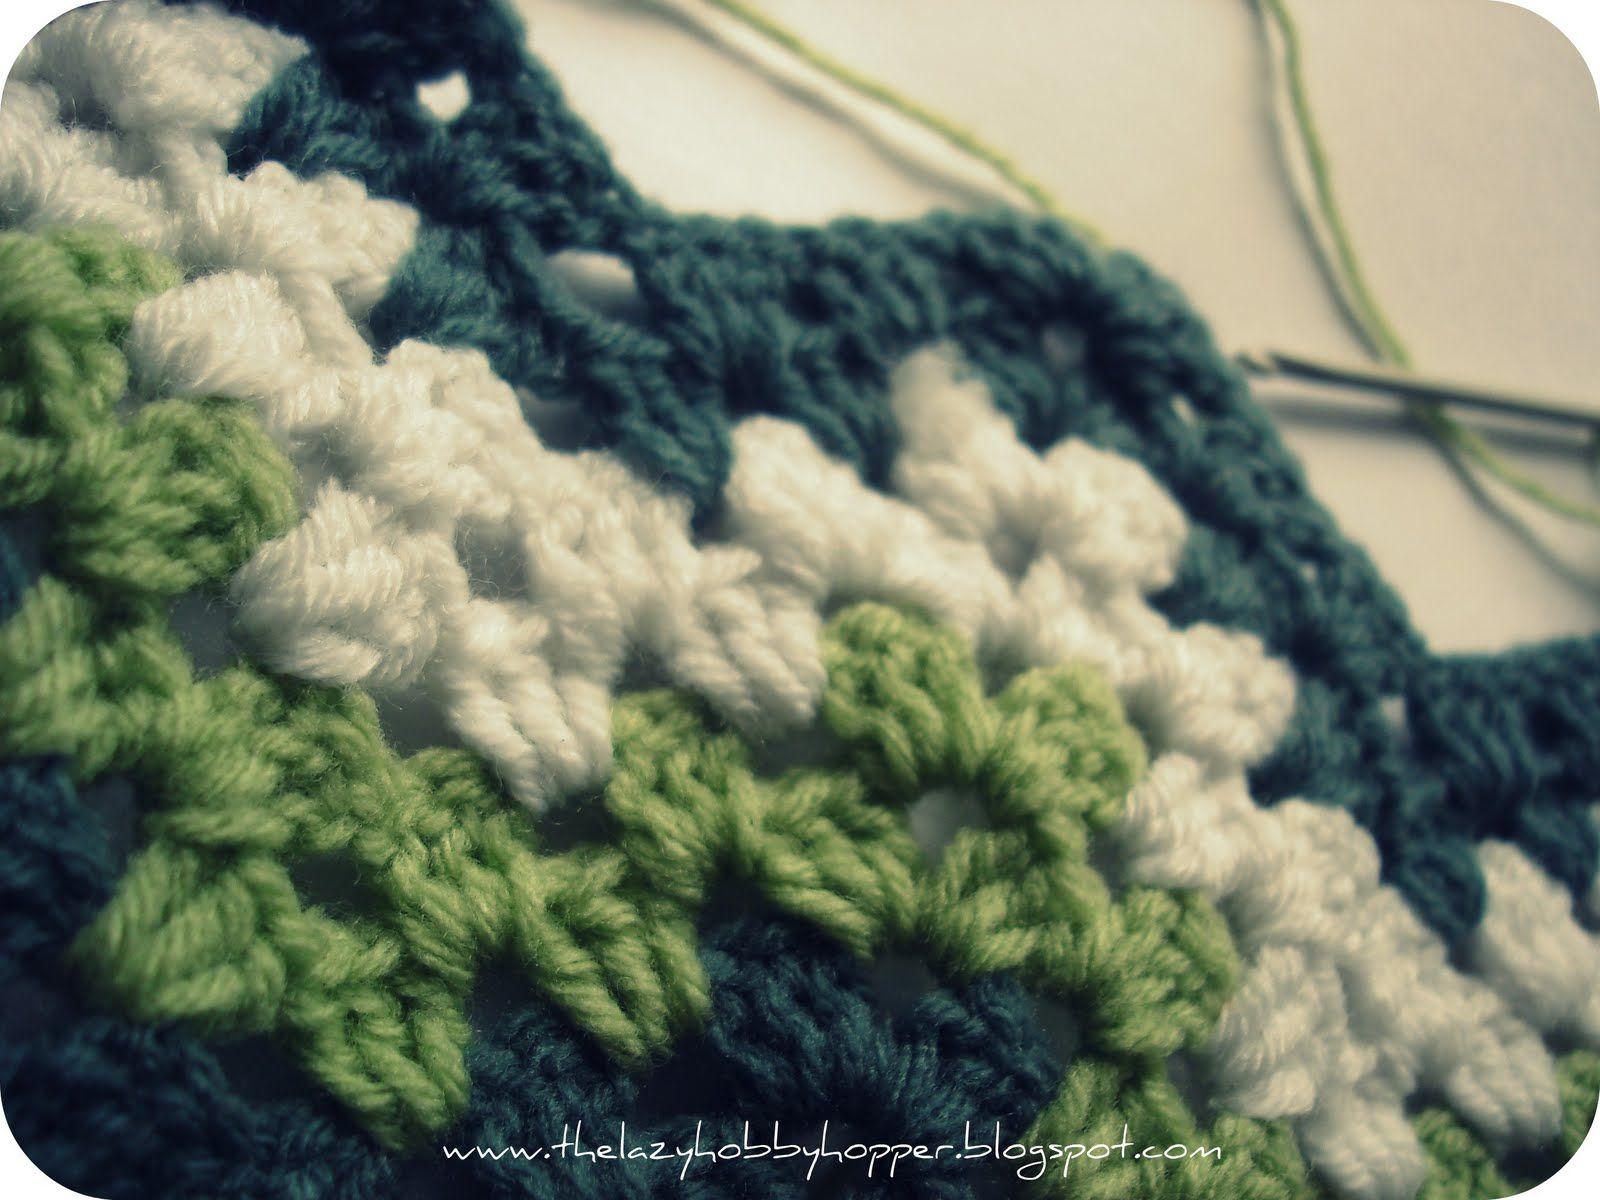 The lazy hobbyhopper how to crochet granny ripple crochet the lazy hobbyhopper how to crochet granny ripple bankloansurffo Images